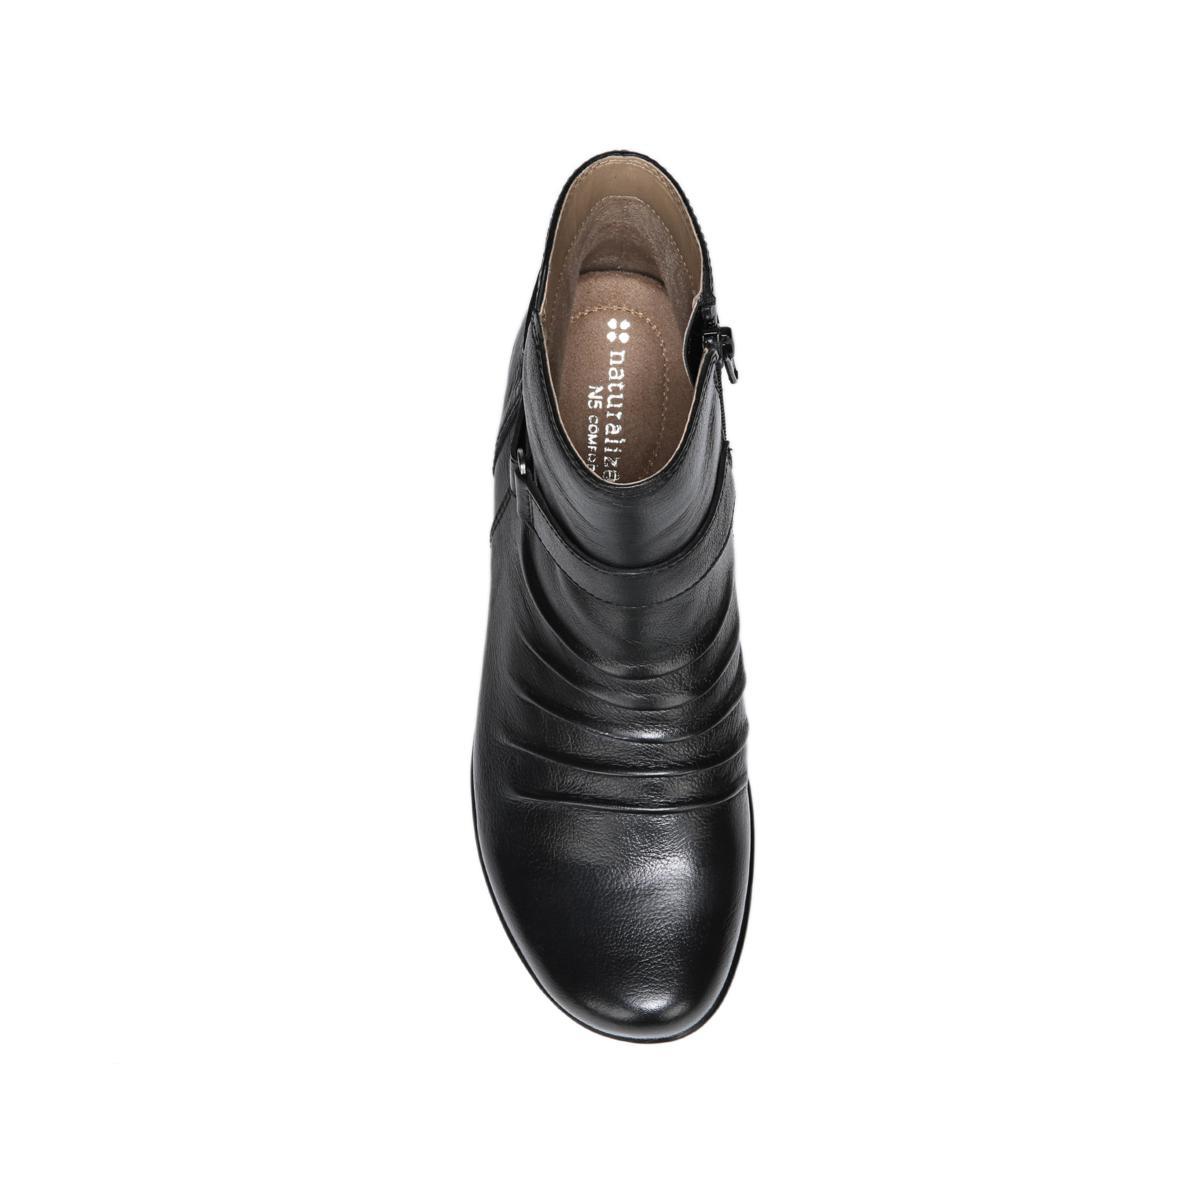 Naturalizer Damenschuhe CASSINI Round Ankle Toe Ankle Round Fashion, schwarz LEATHER ... efeaa5